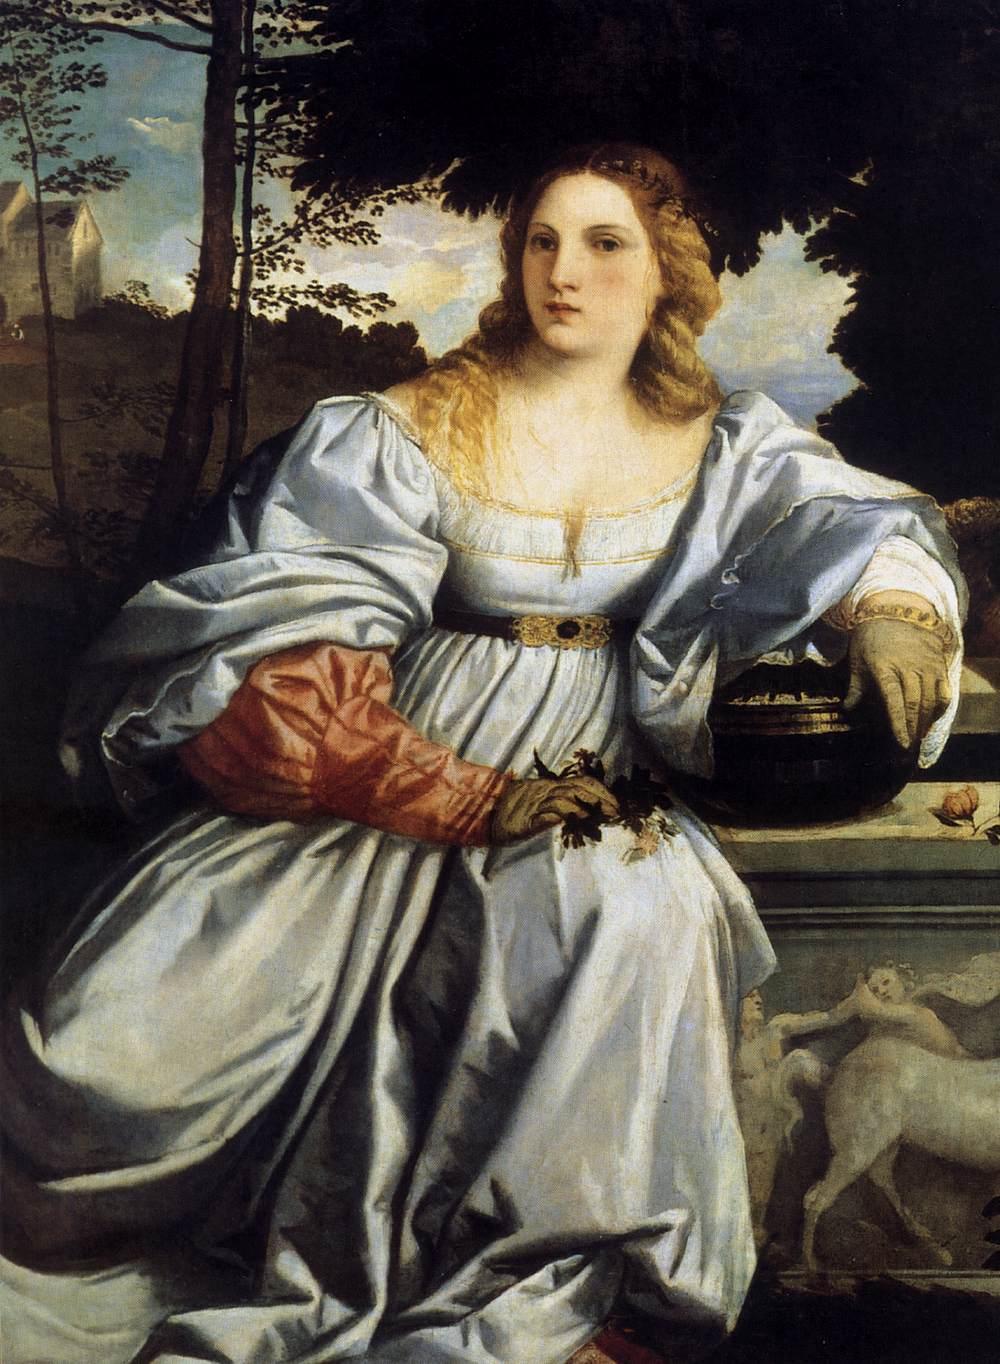 Sagrado e Profano Amor - Sacred and Profane Love - qaz.wiki